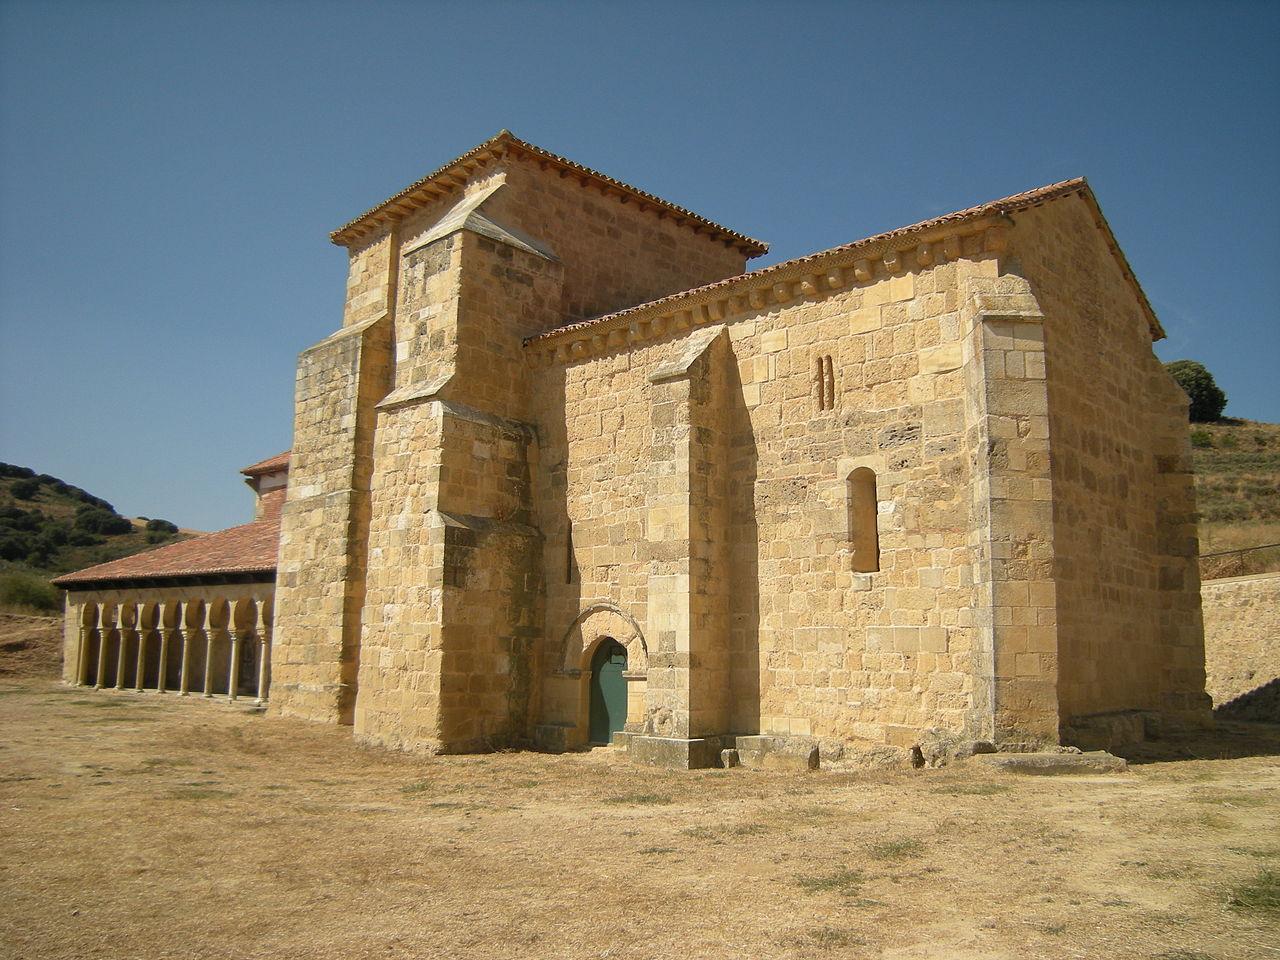 1280px-Iglesia_de_San_Miguel_de_Escalada_(5024991635).jpg